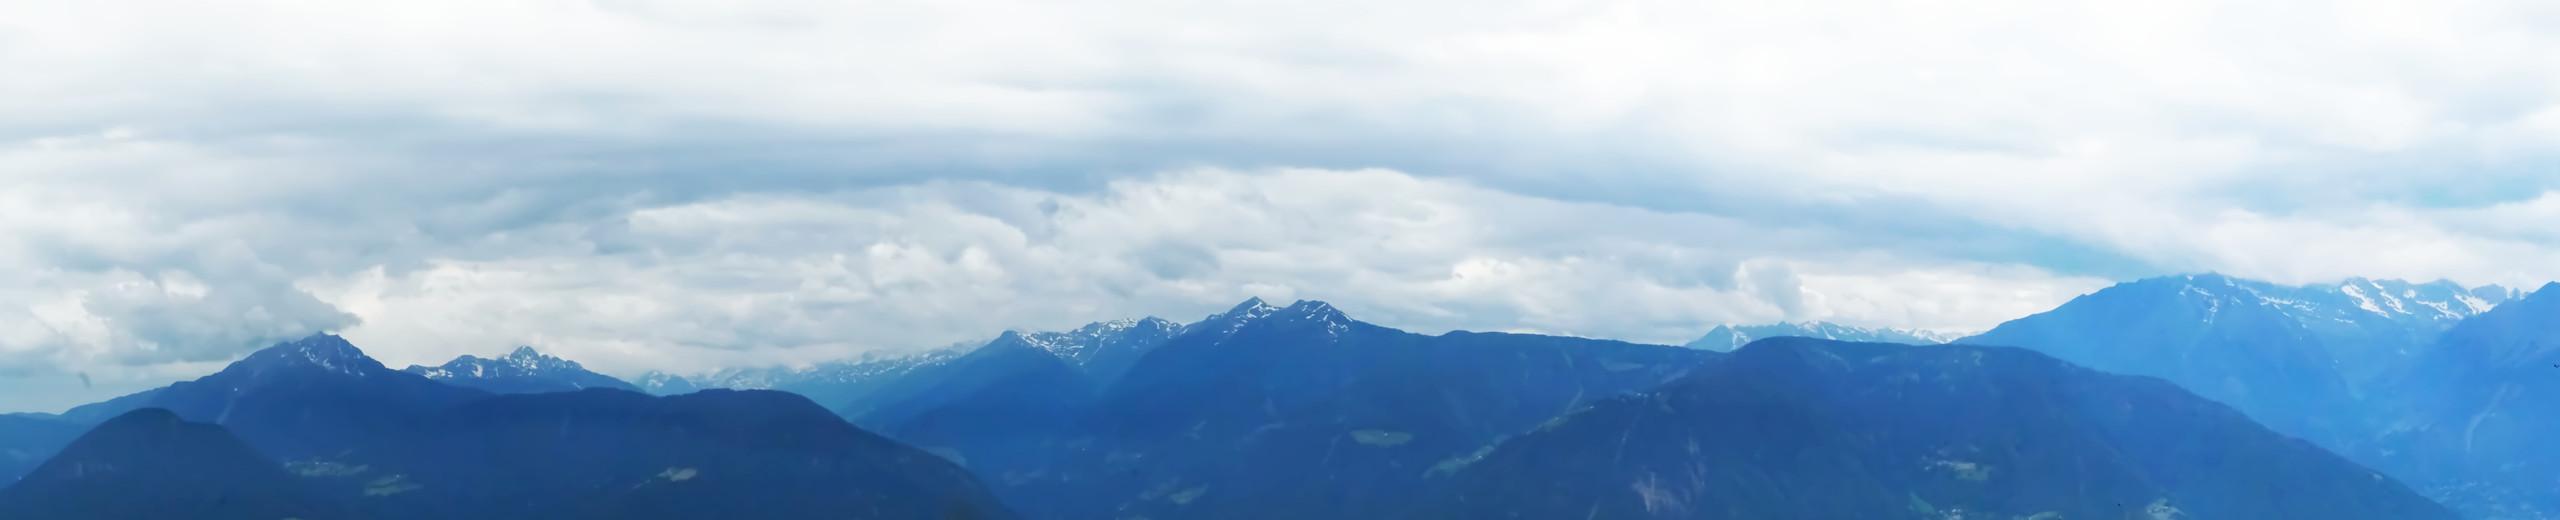 View from Knottkino, Italian Alps